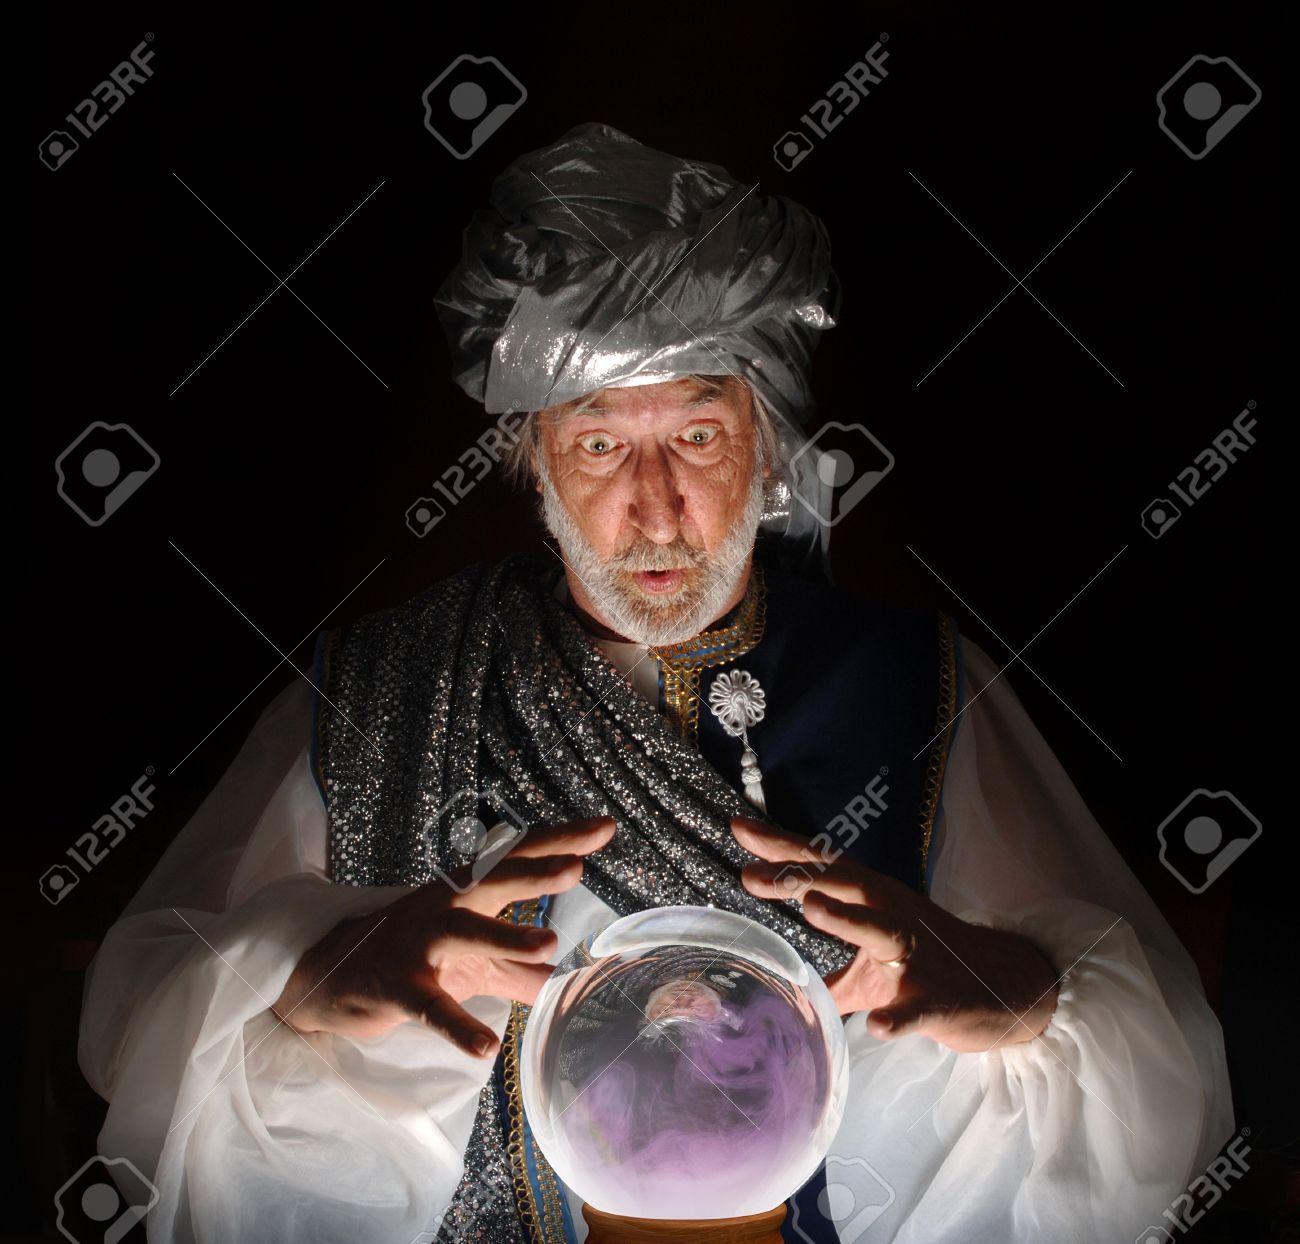 9519798-swami-gazing-into-a-crystal-ball